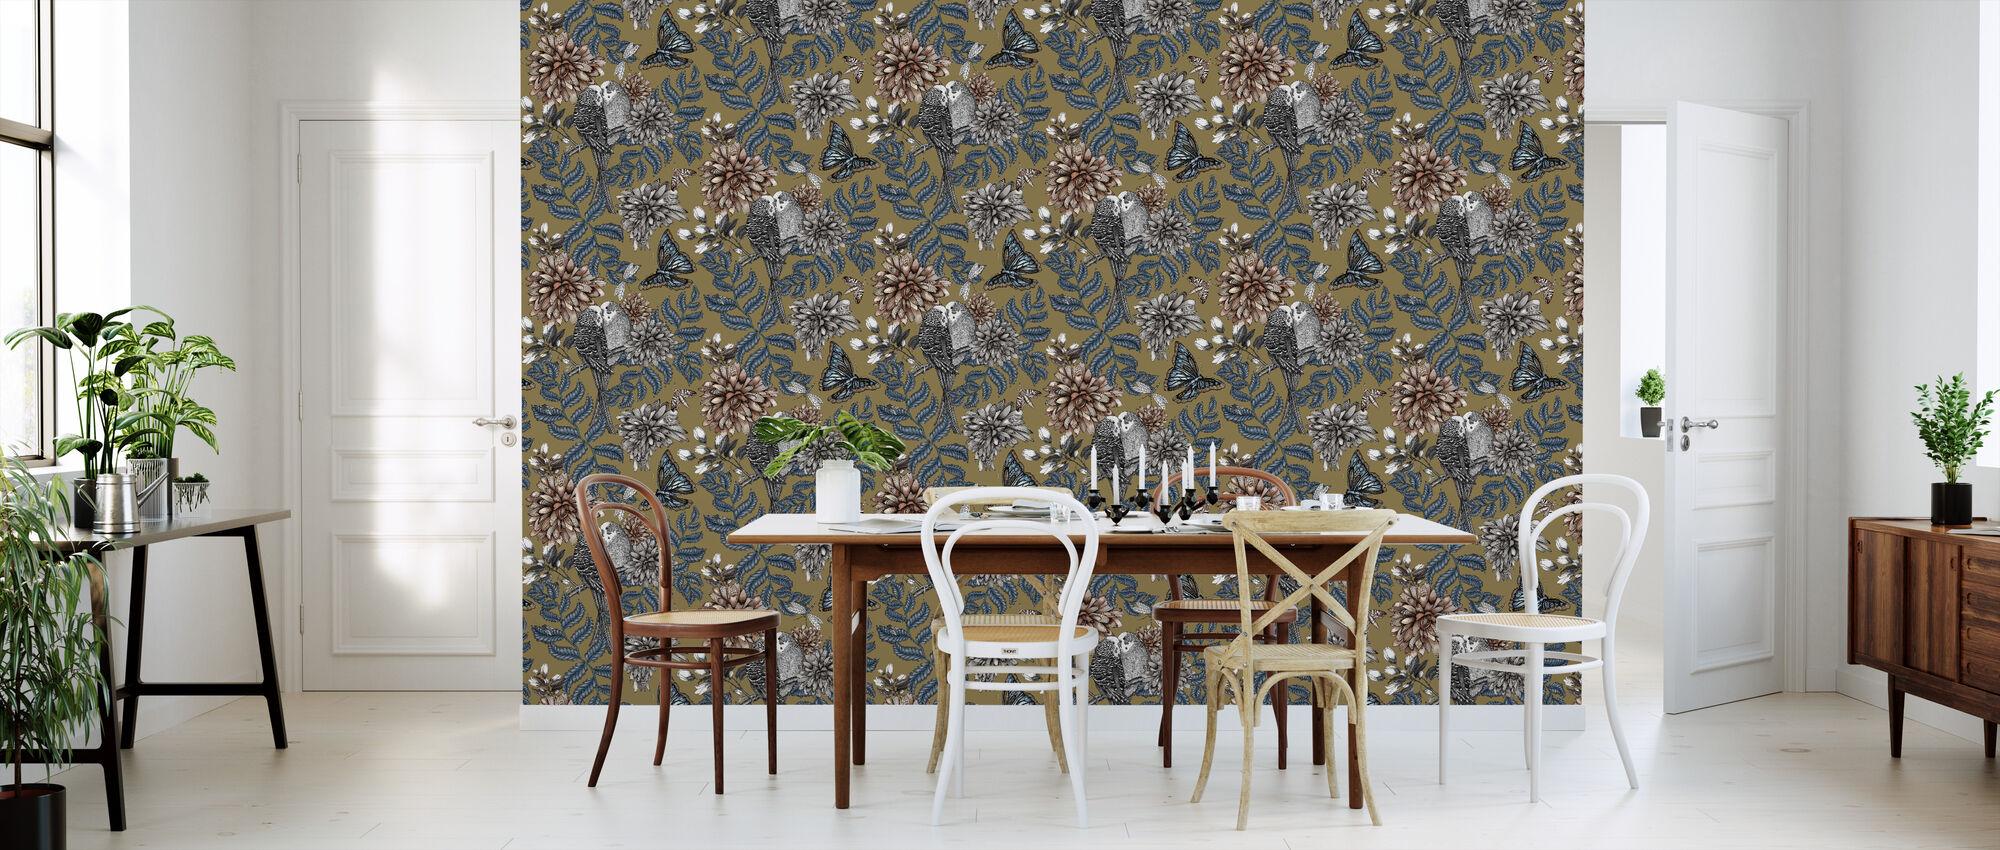 Lovebirds Gold - Small - Wallpaper - Kitchen